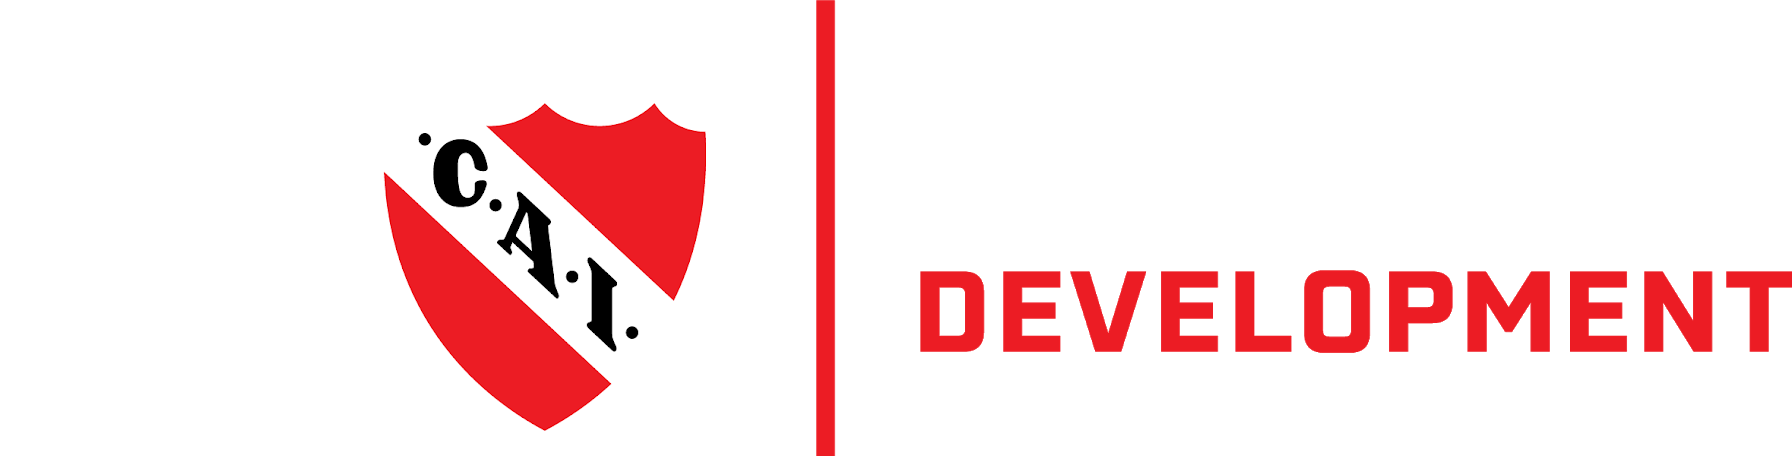 Youth Footbal Development